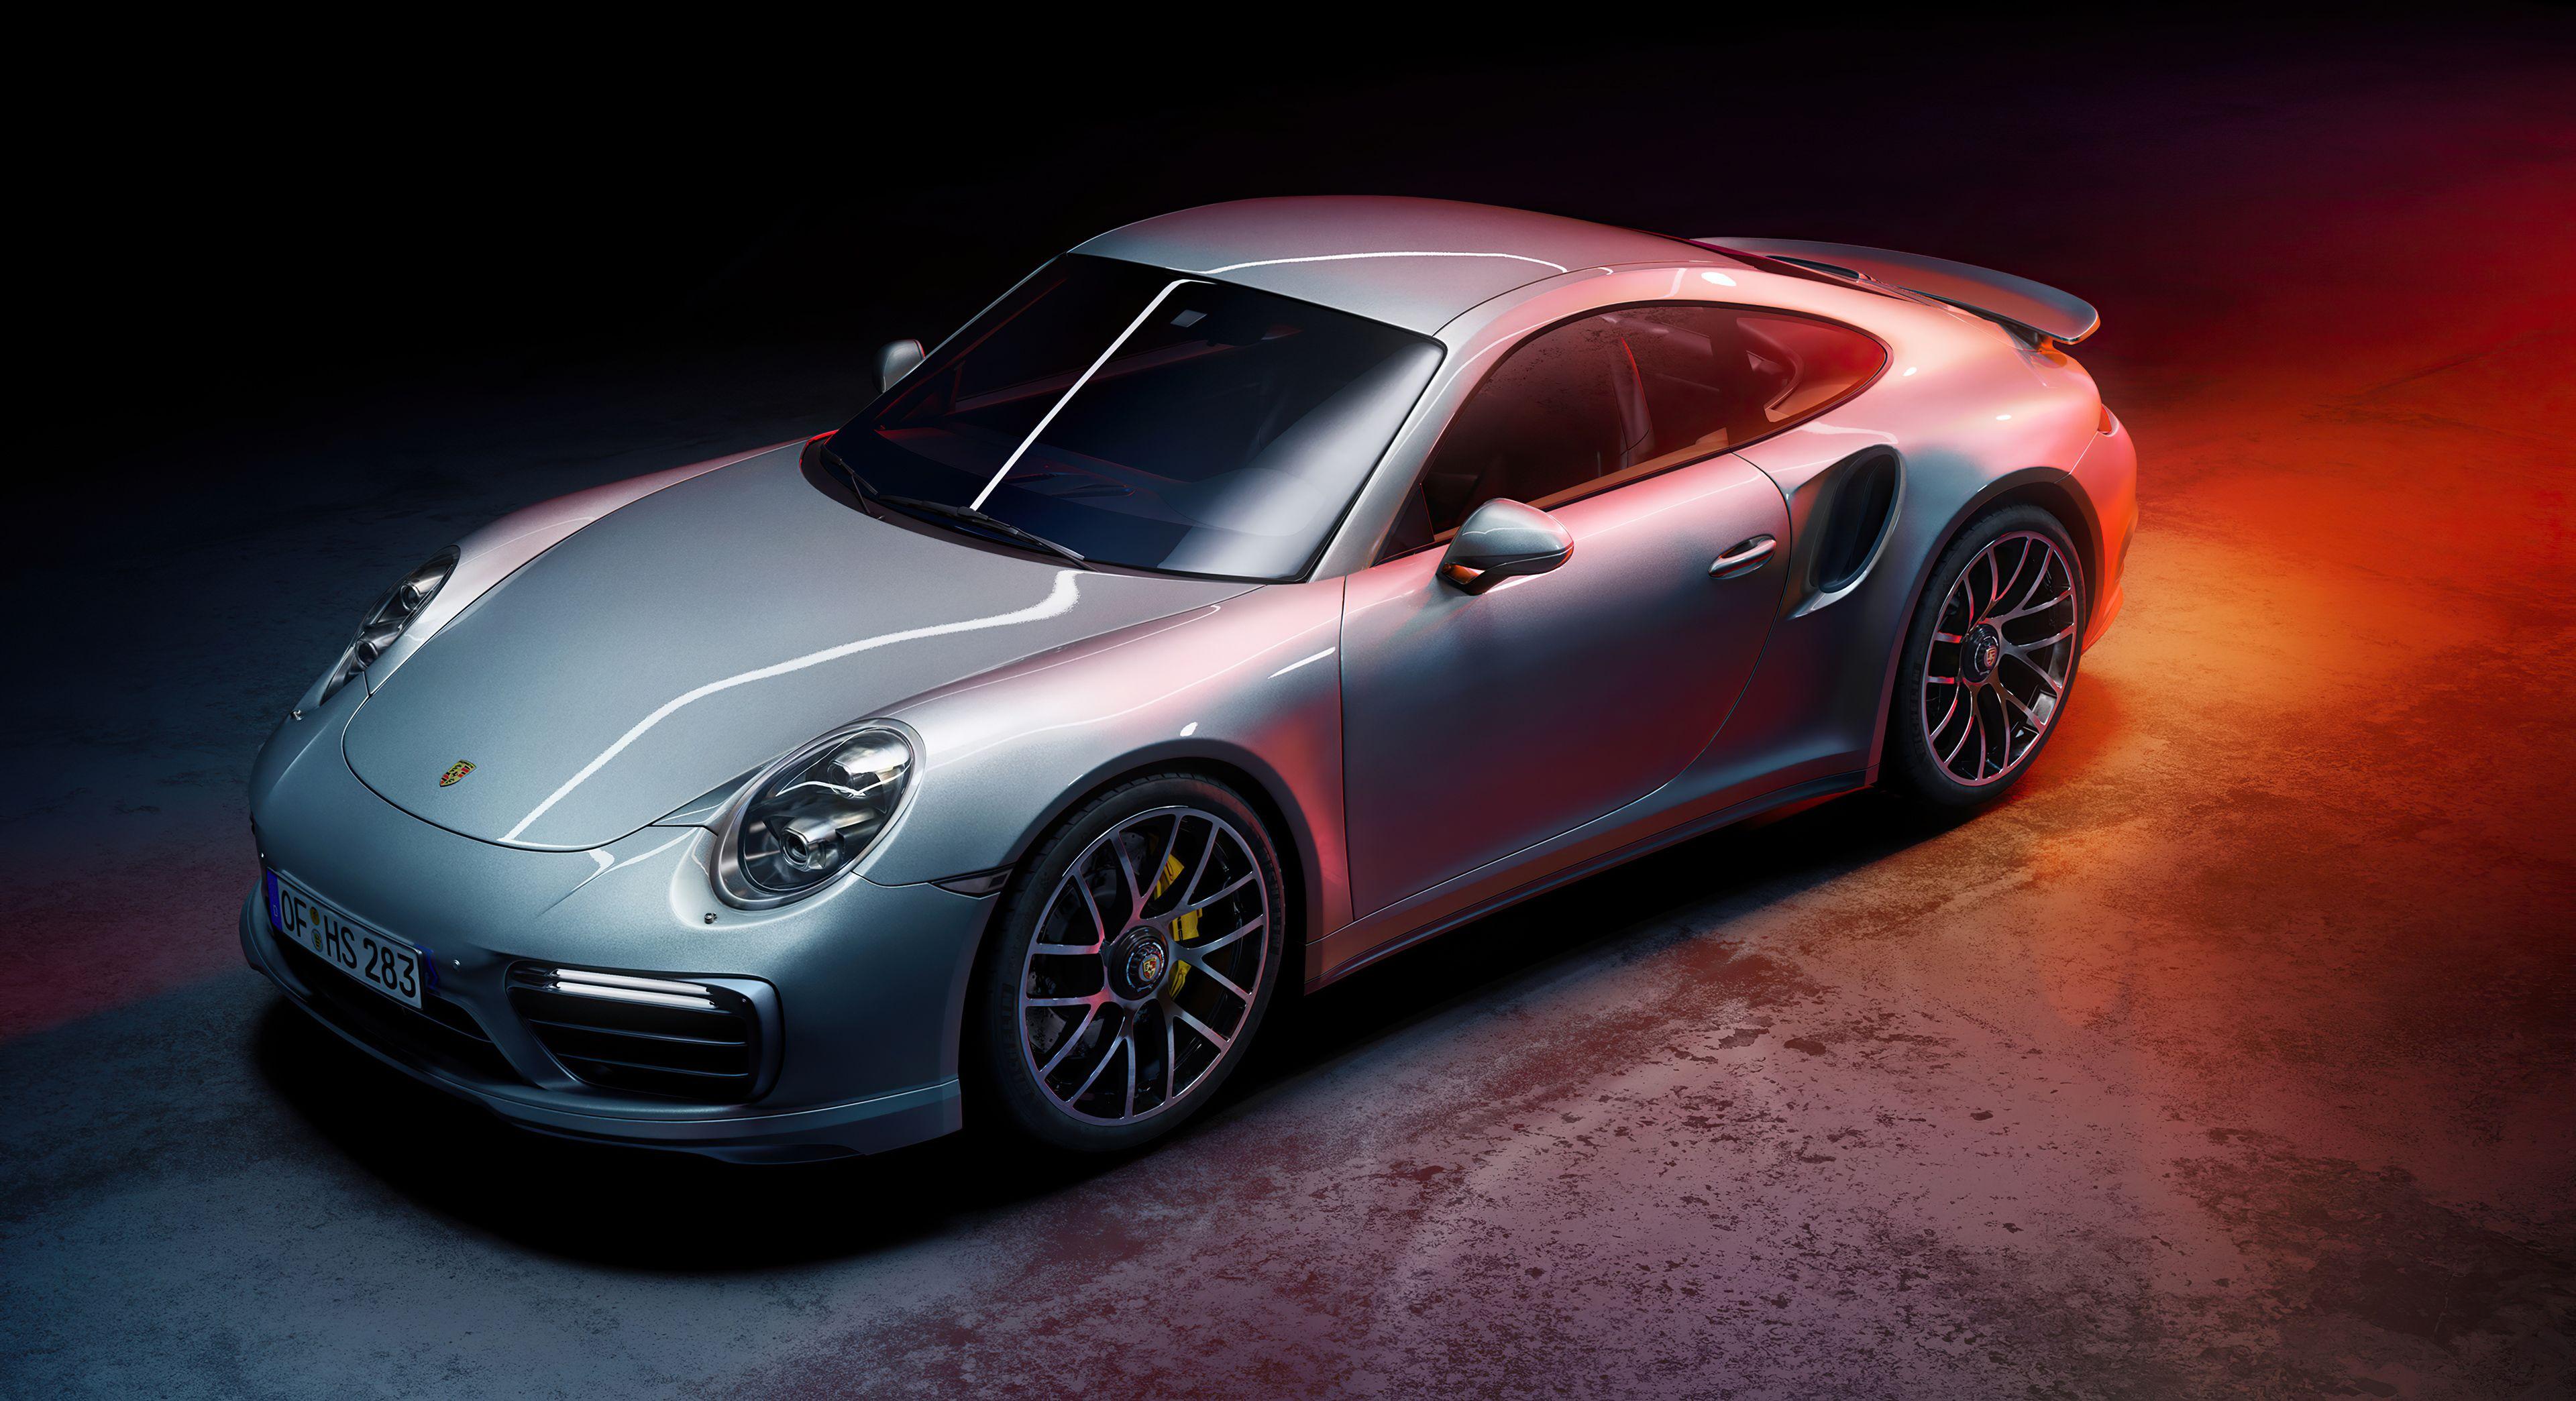 Porsche 4k 2020 Porsche 911 Turbo 911 Turbo S Porsche